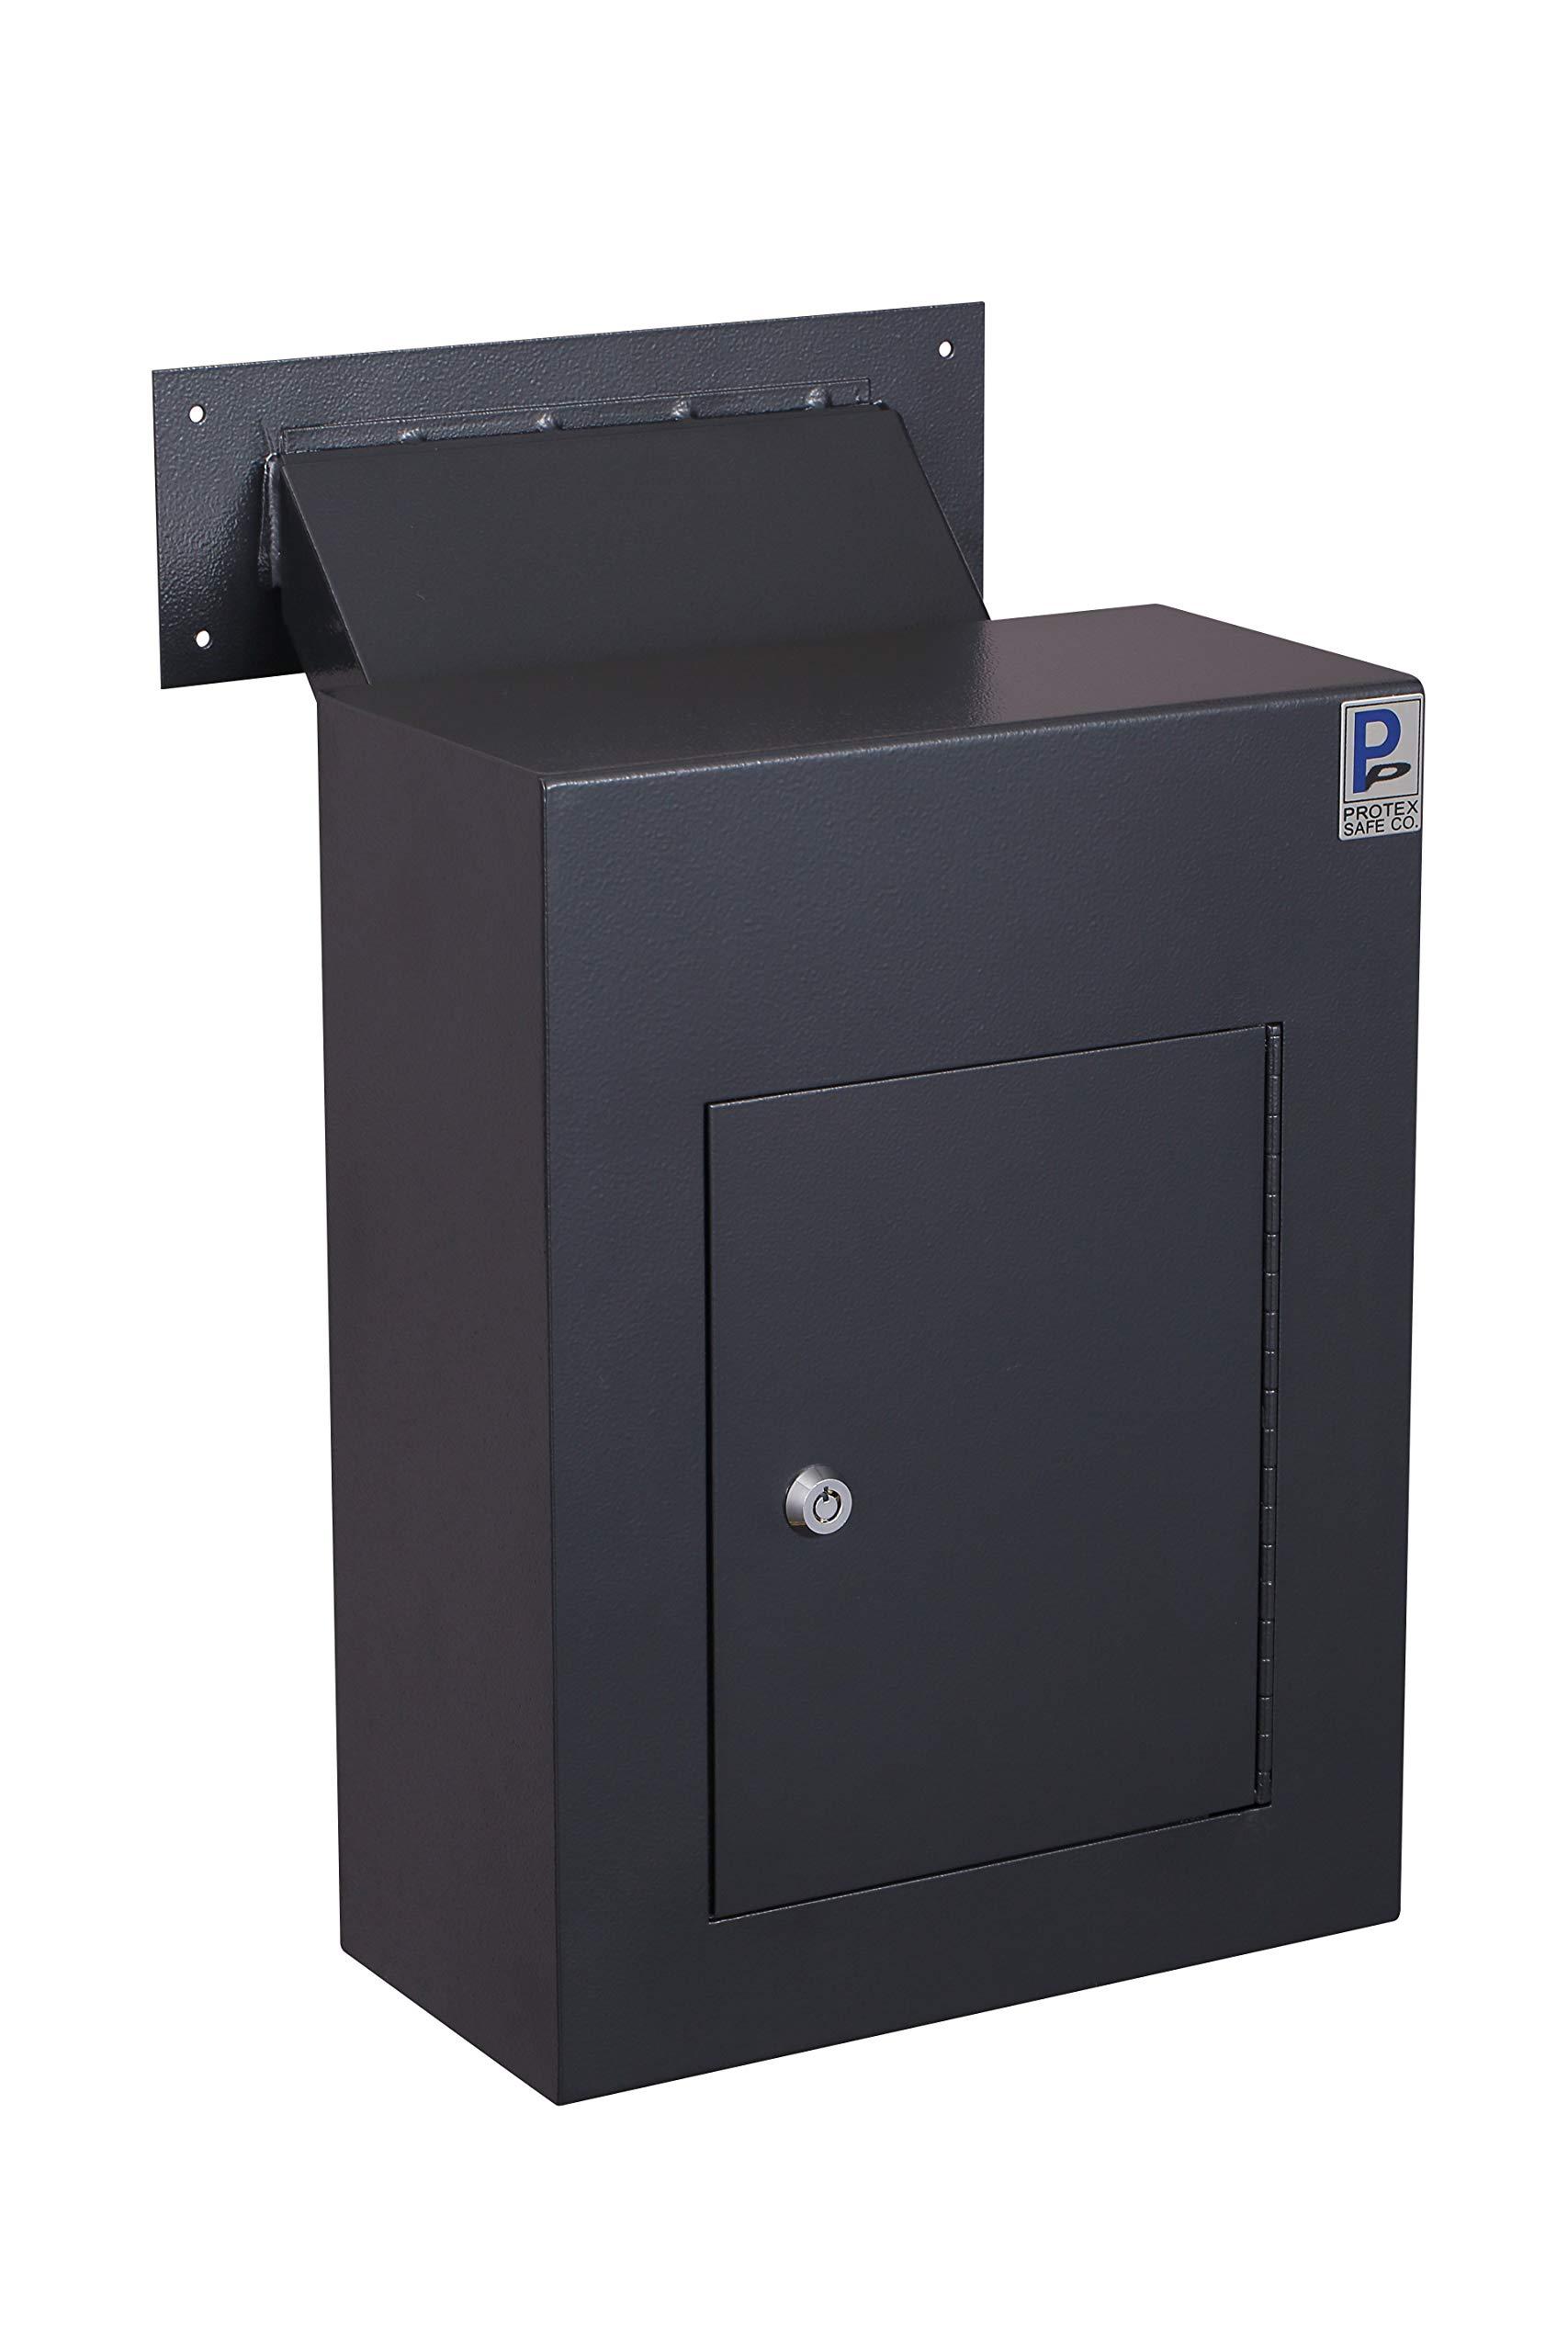 Protex WDC-160 BLACK Wall Drop Box With Adjustable Chute, Black